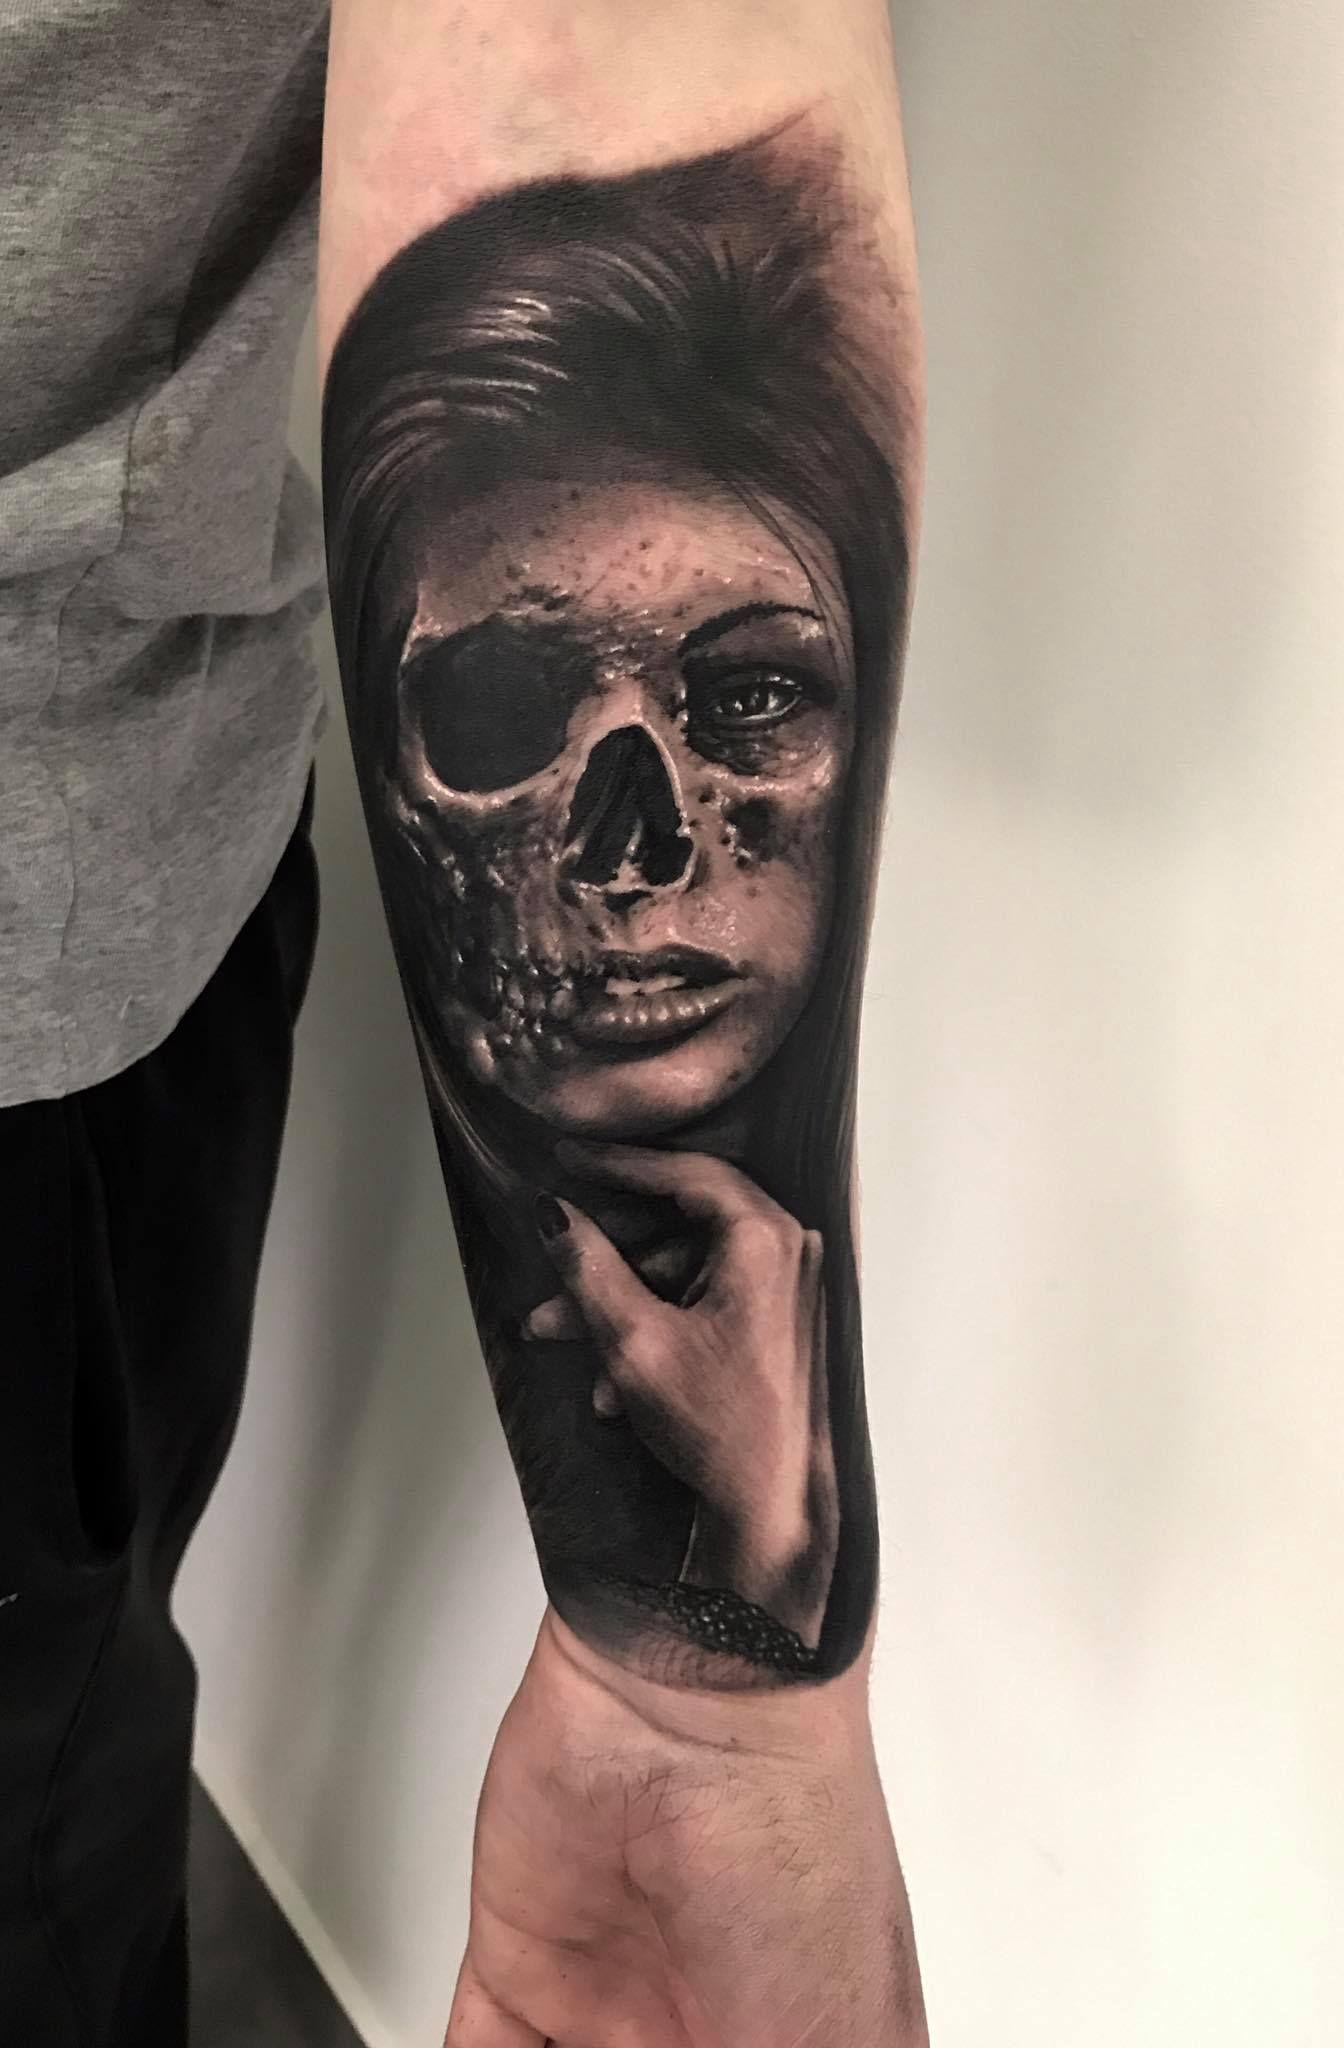 6bf15b3de Woman and Skull tattoo by Maciek! Limited availability at Revival Tattoo  Studio!